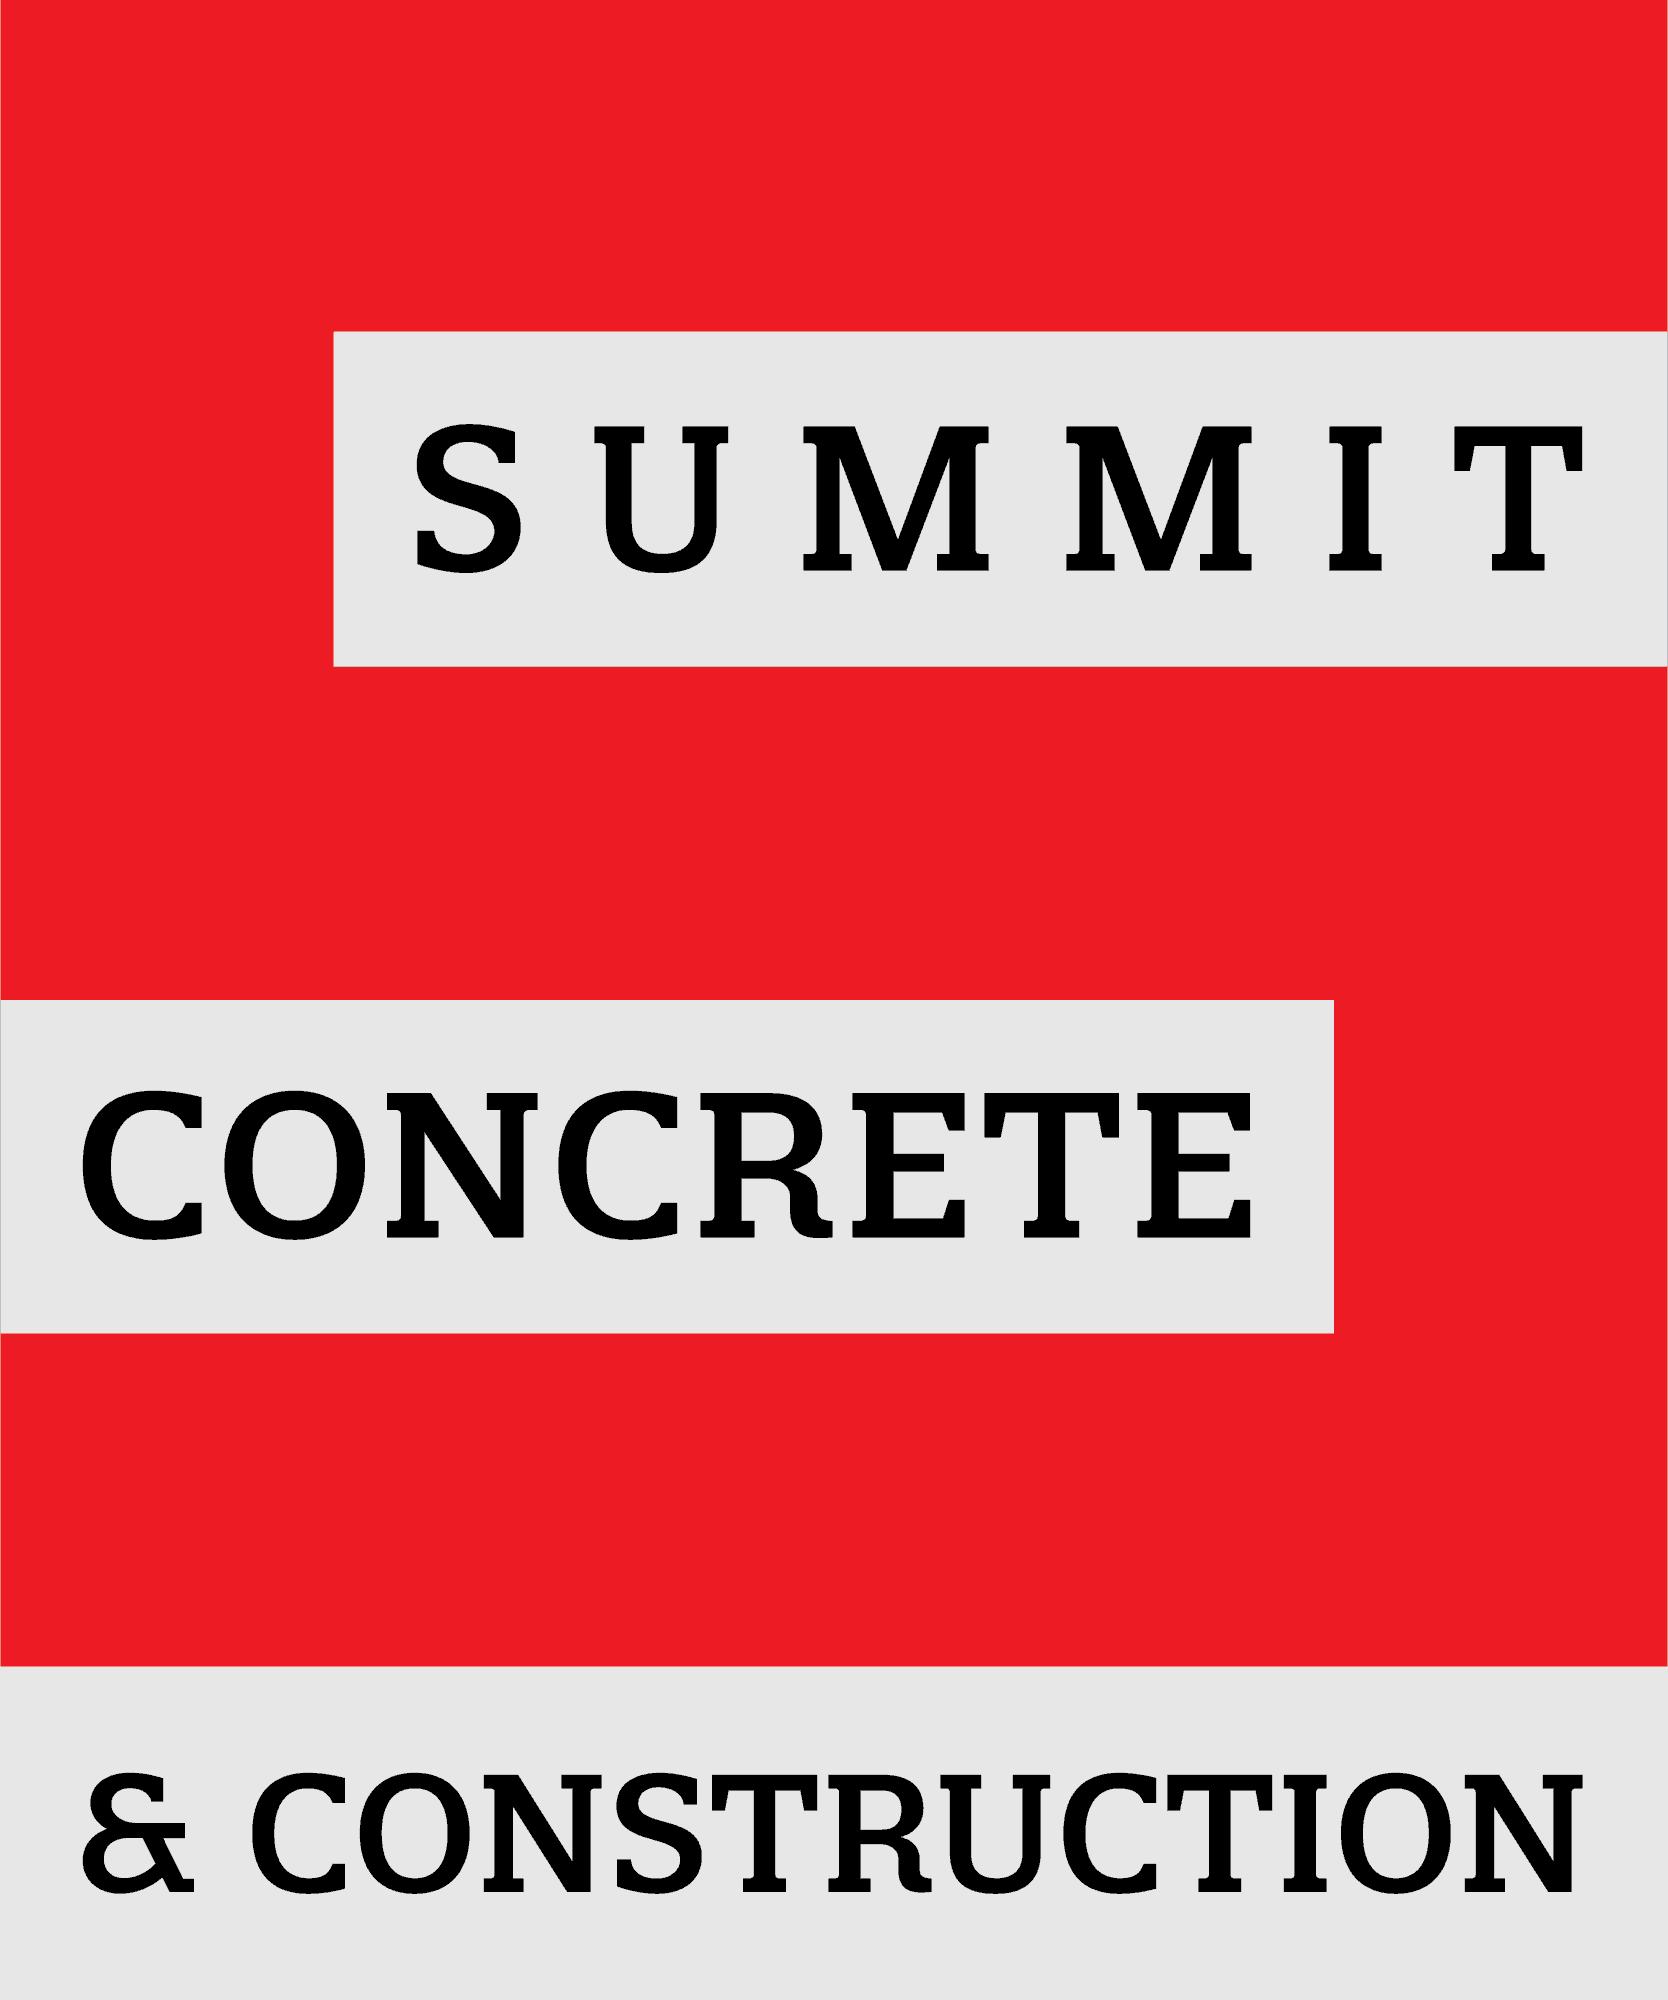 Summit Concrete & Construction logo